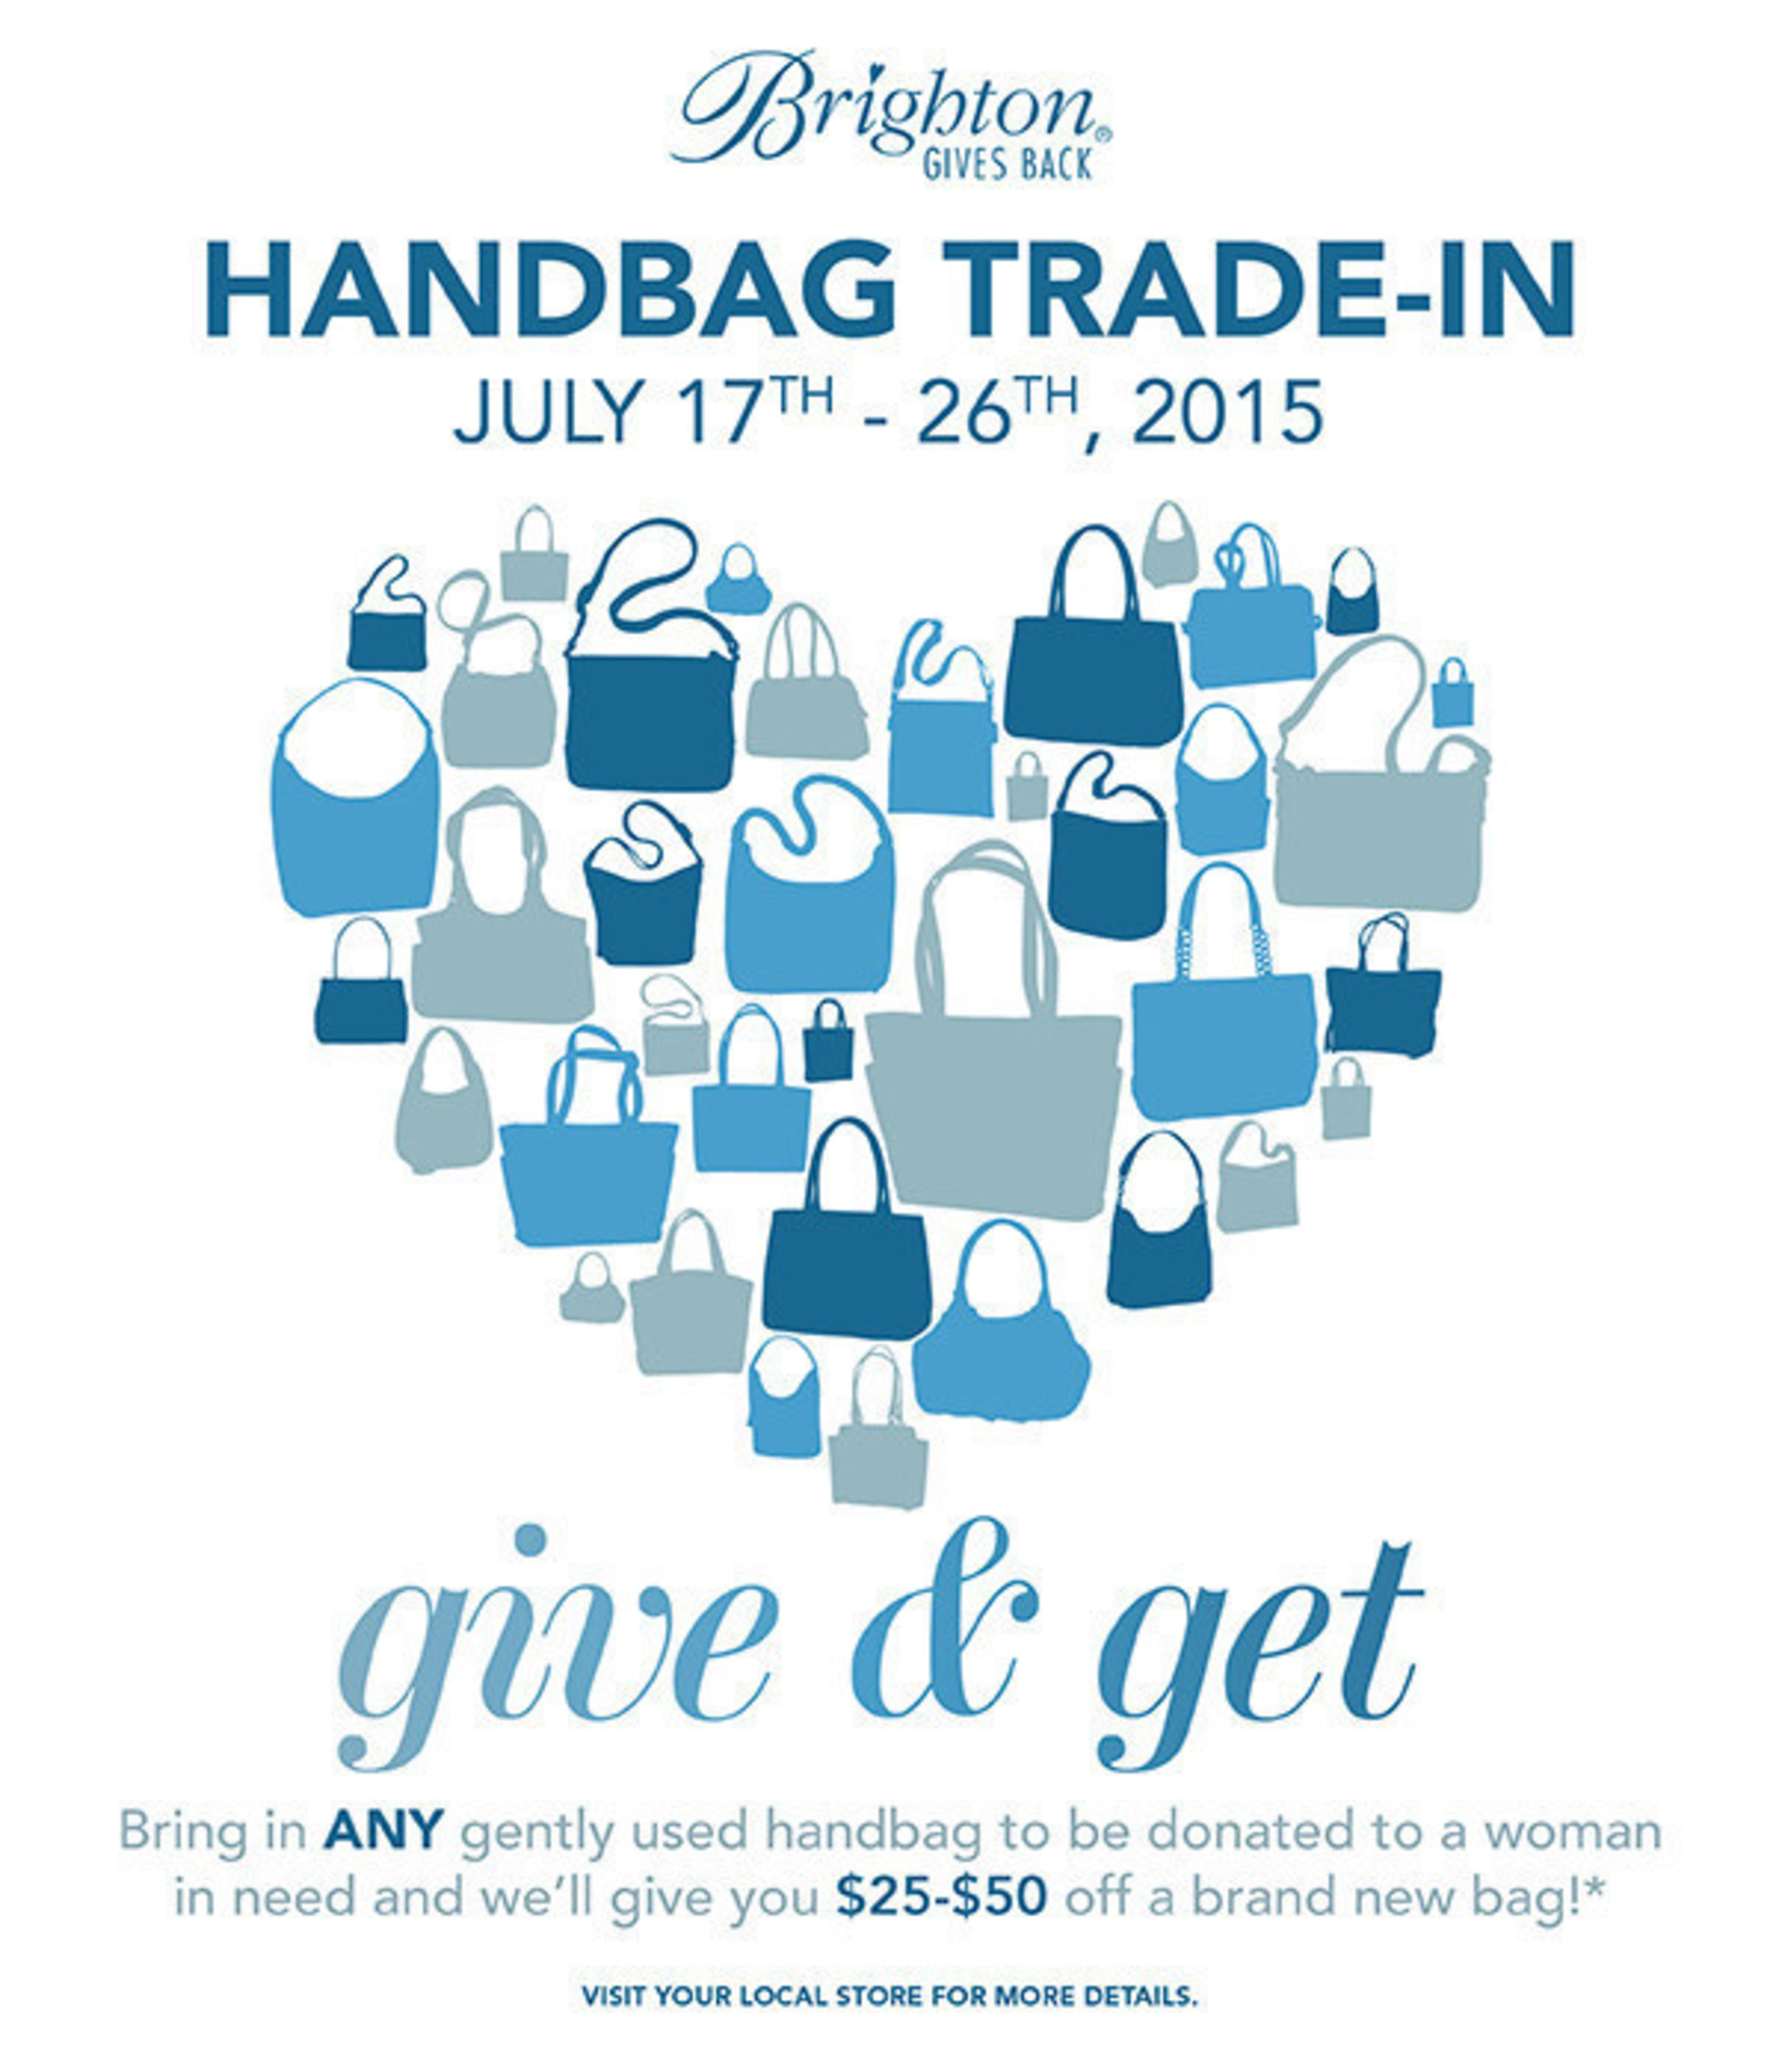 Brighton Handbag Trade-in July 17th - 26th, 2015